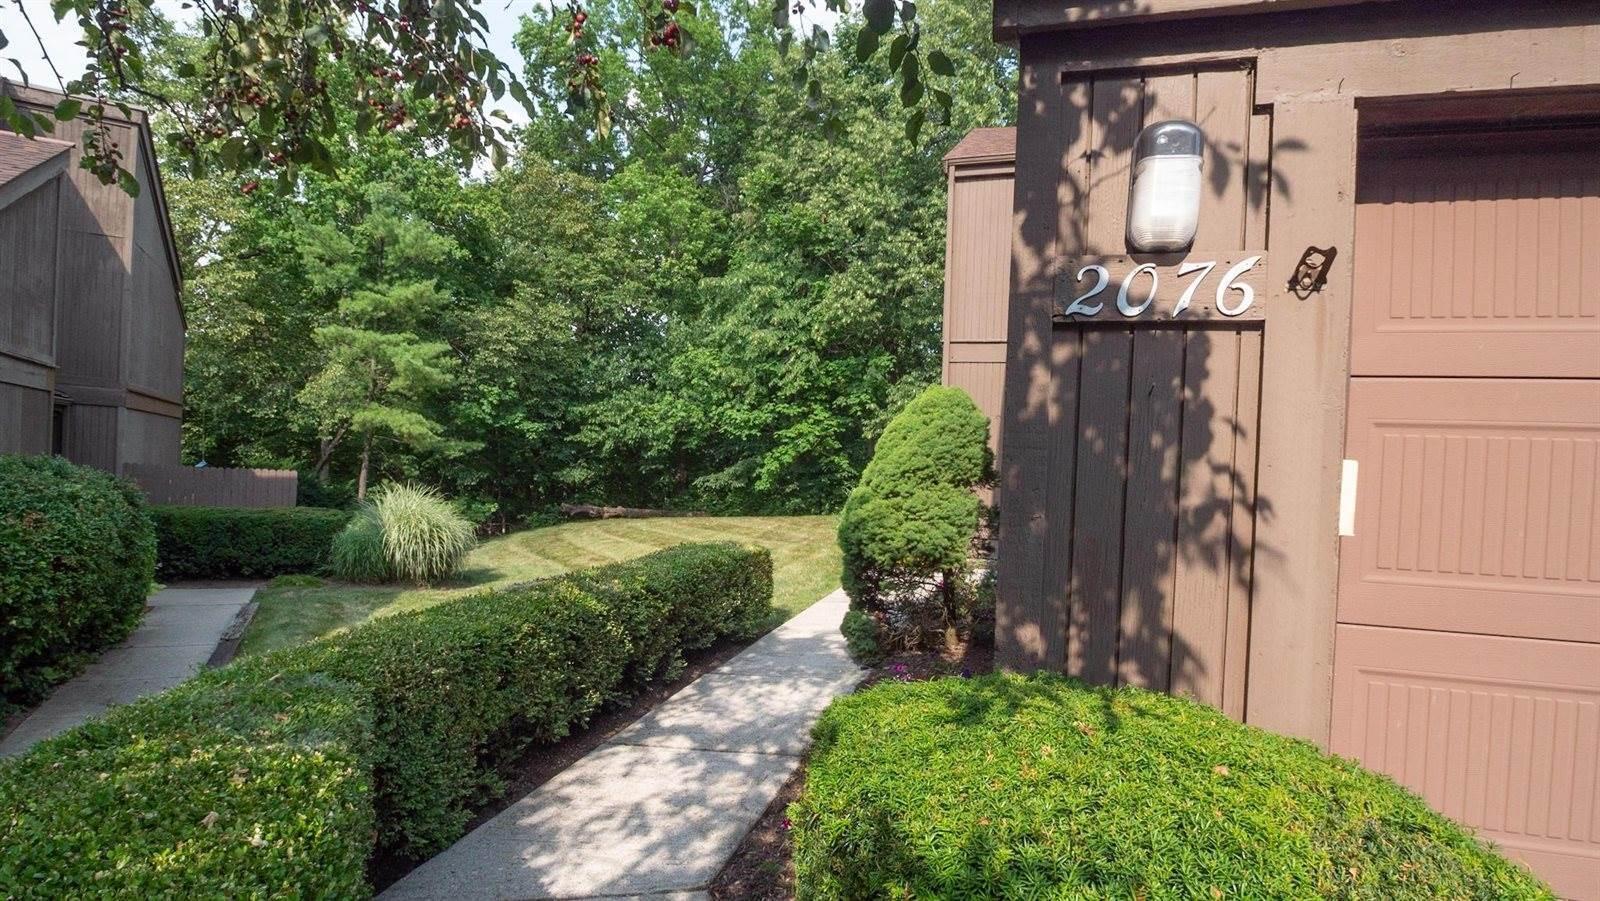 2076 Willowick Circle, #A, Columbus, OH 43229